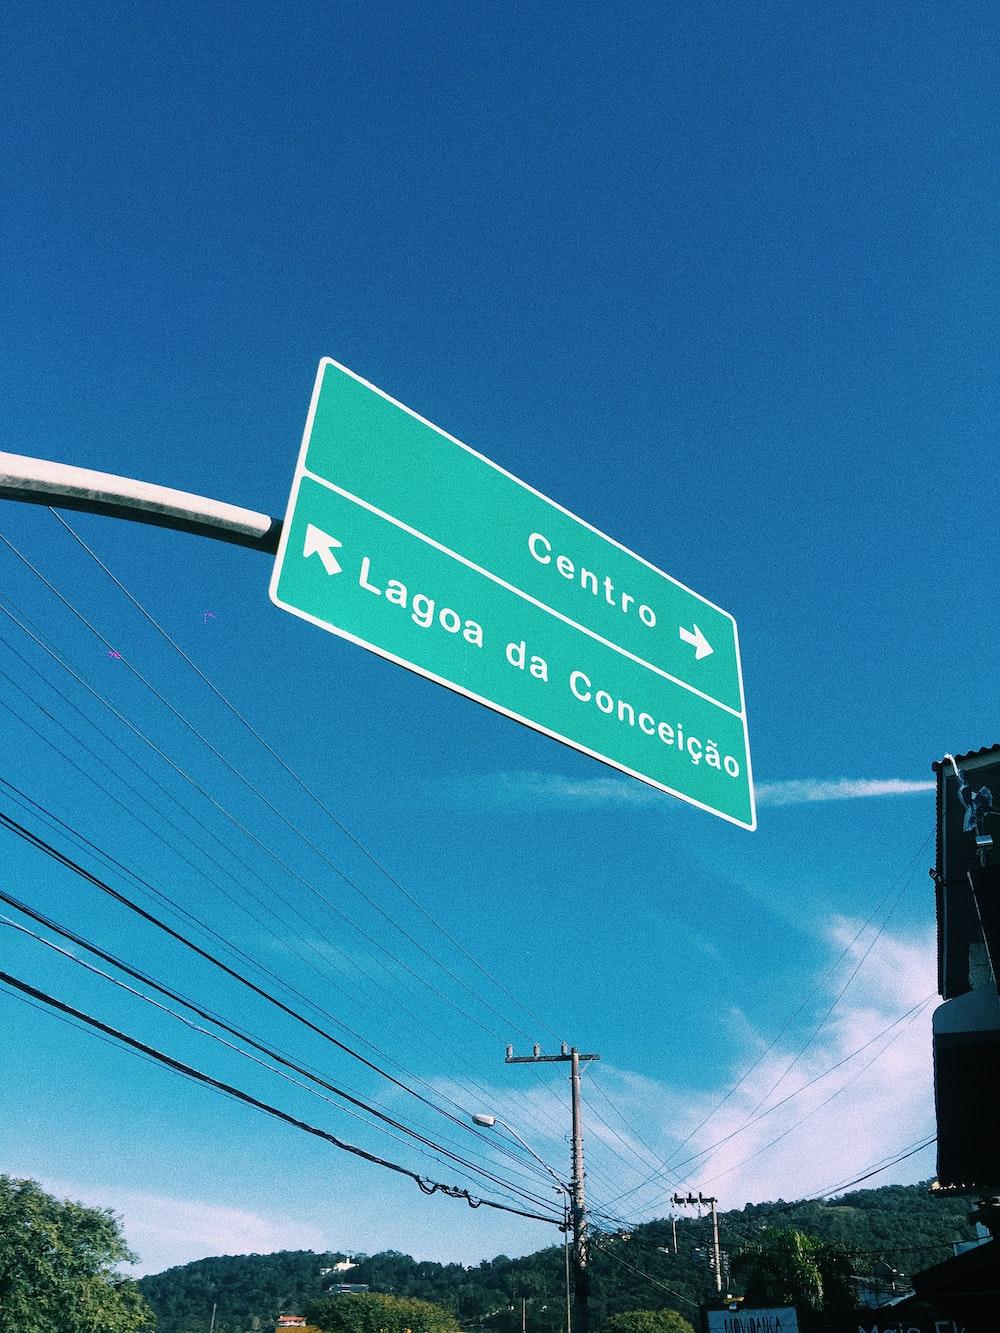 Centro Lagoa da Conceicao signage